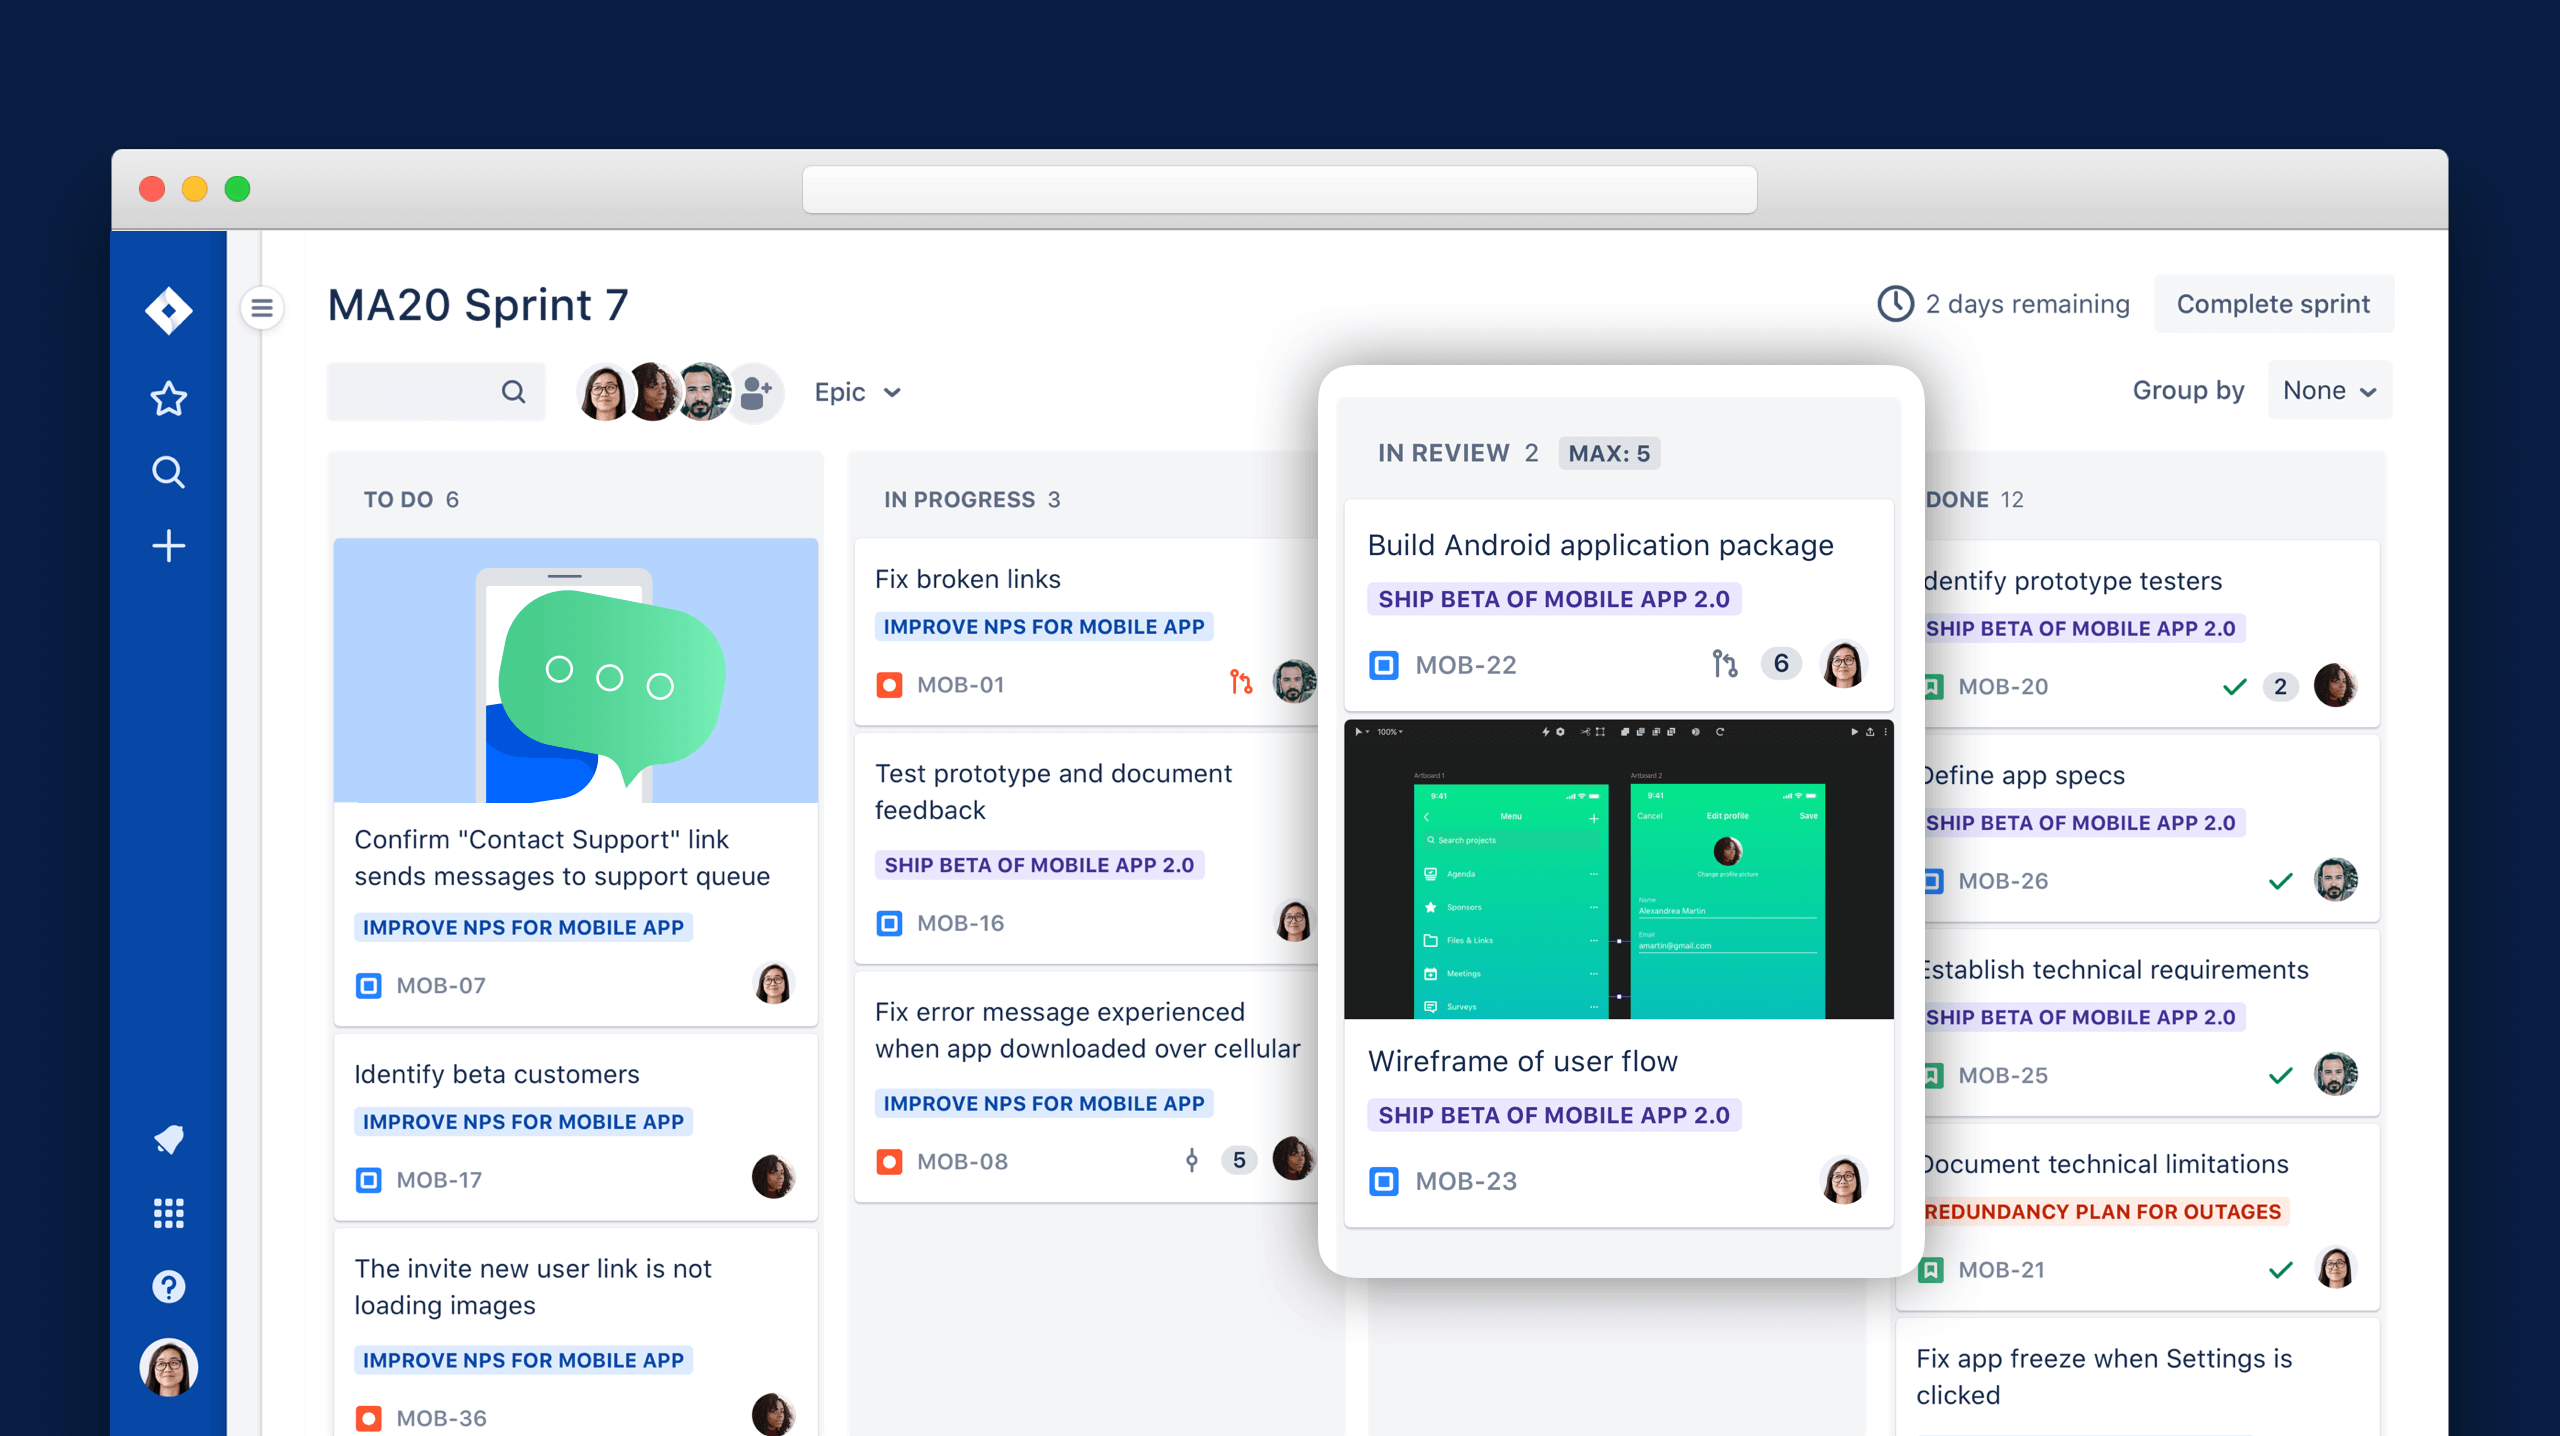 Cartões Kanban digitais num painel do Trello | Atlassian Agile Coach